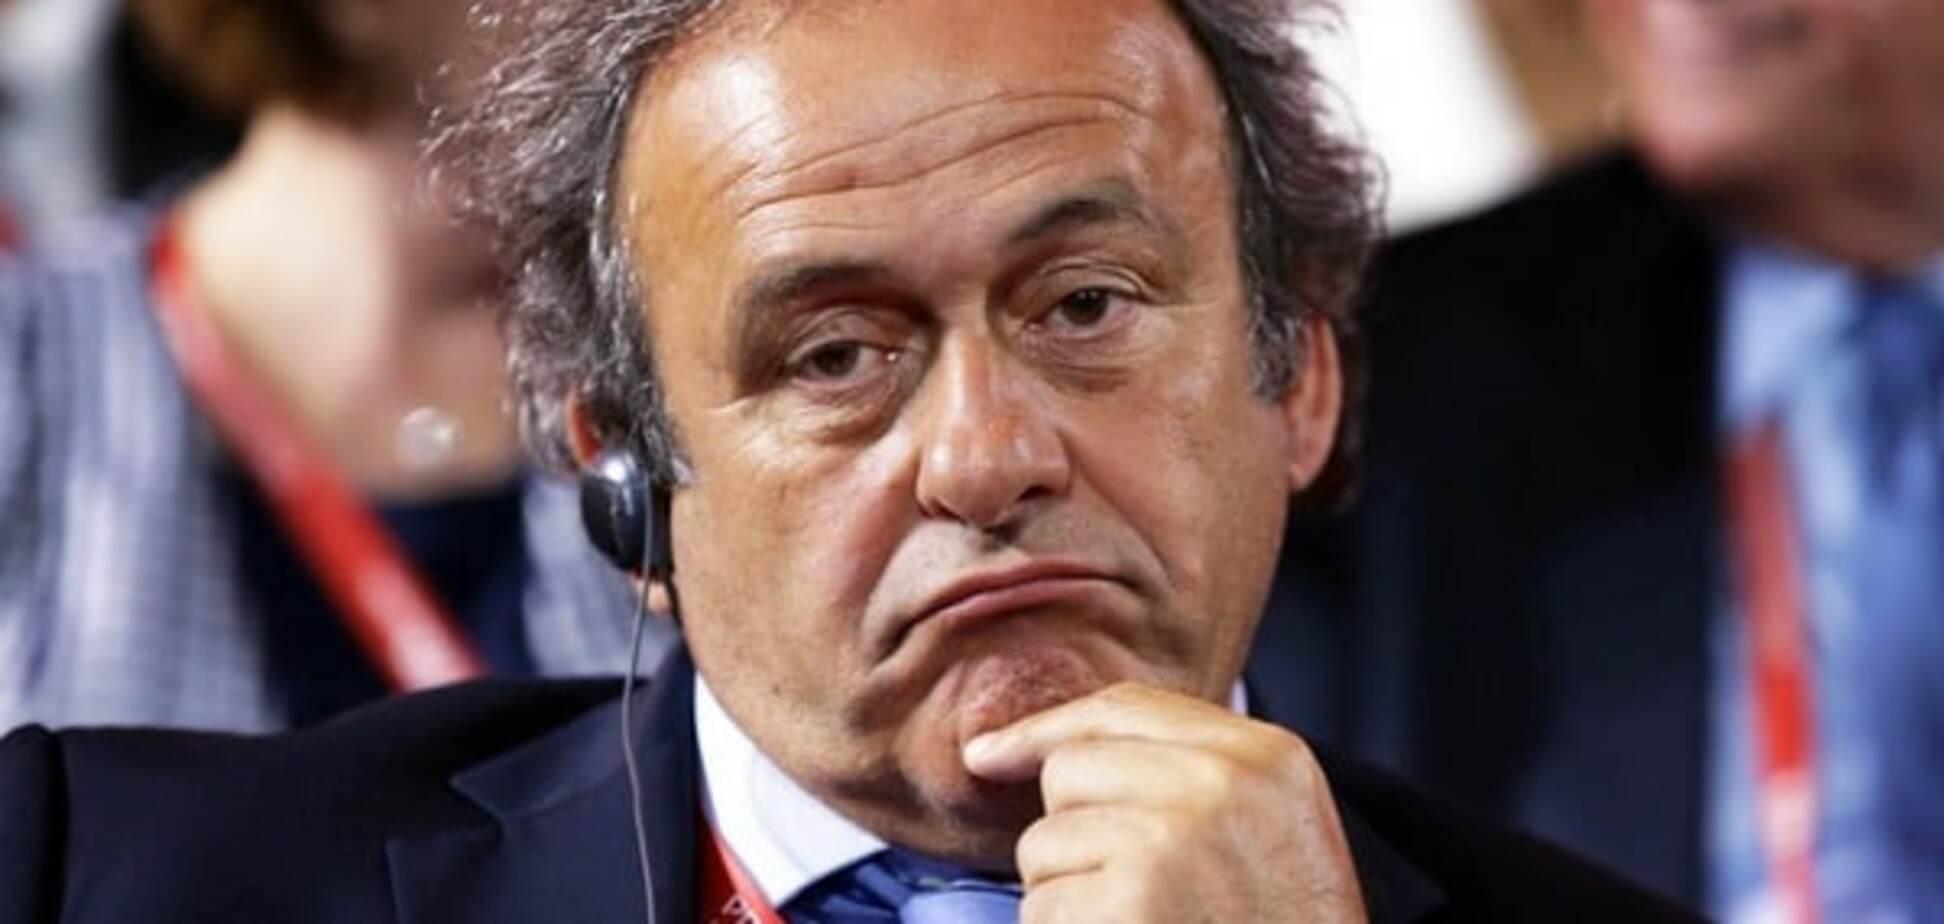 Арест Мишеля Платини: у экс-президента УЕФА сделали заявление